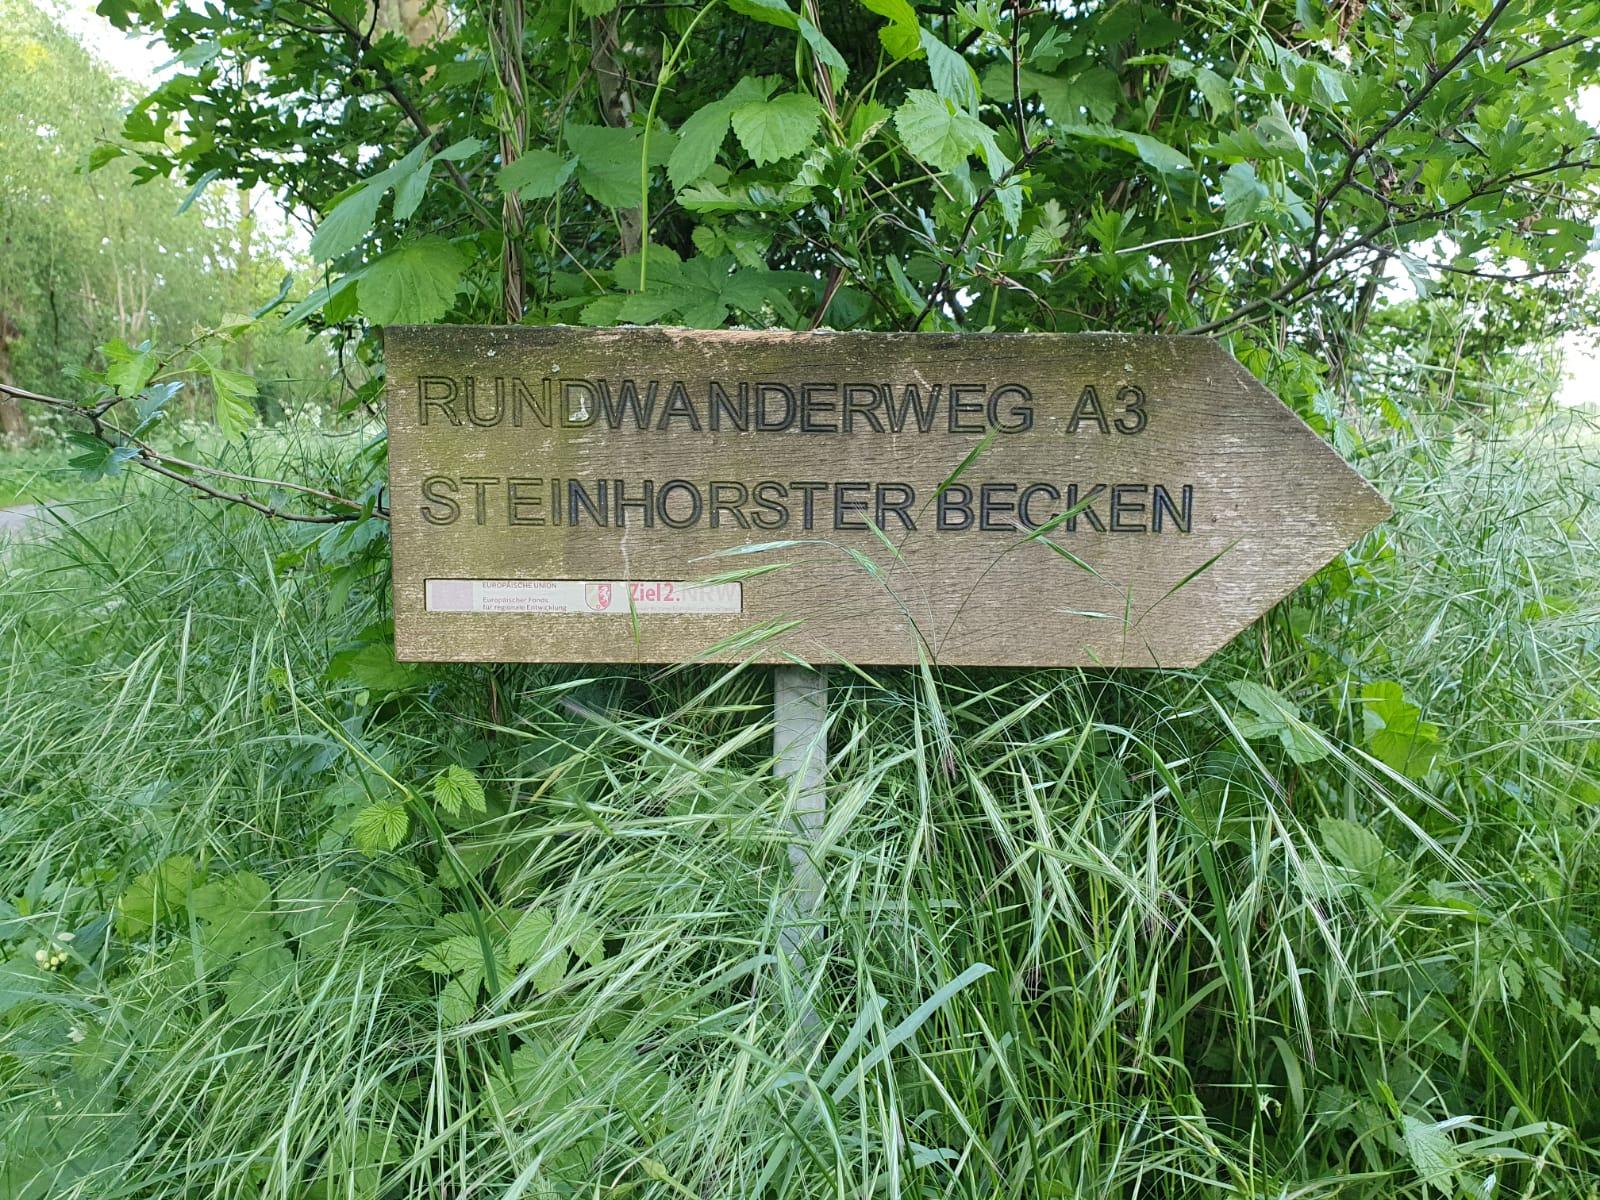 Beimdiek-Klaus-Peter-19-Challenge-Steinhorster-Becken-F4W8B